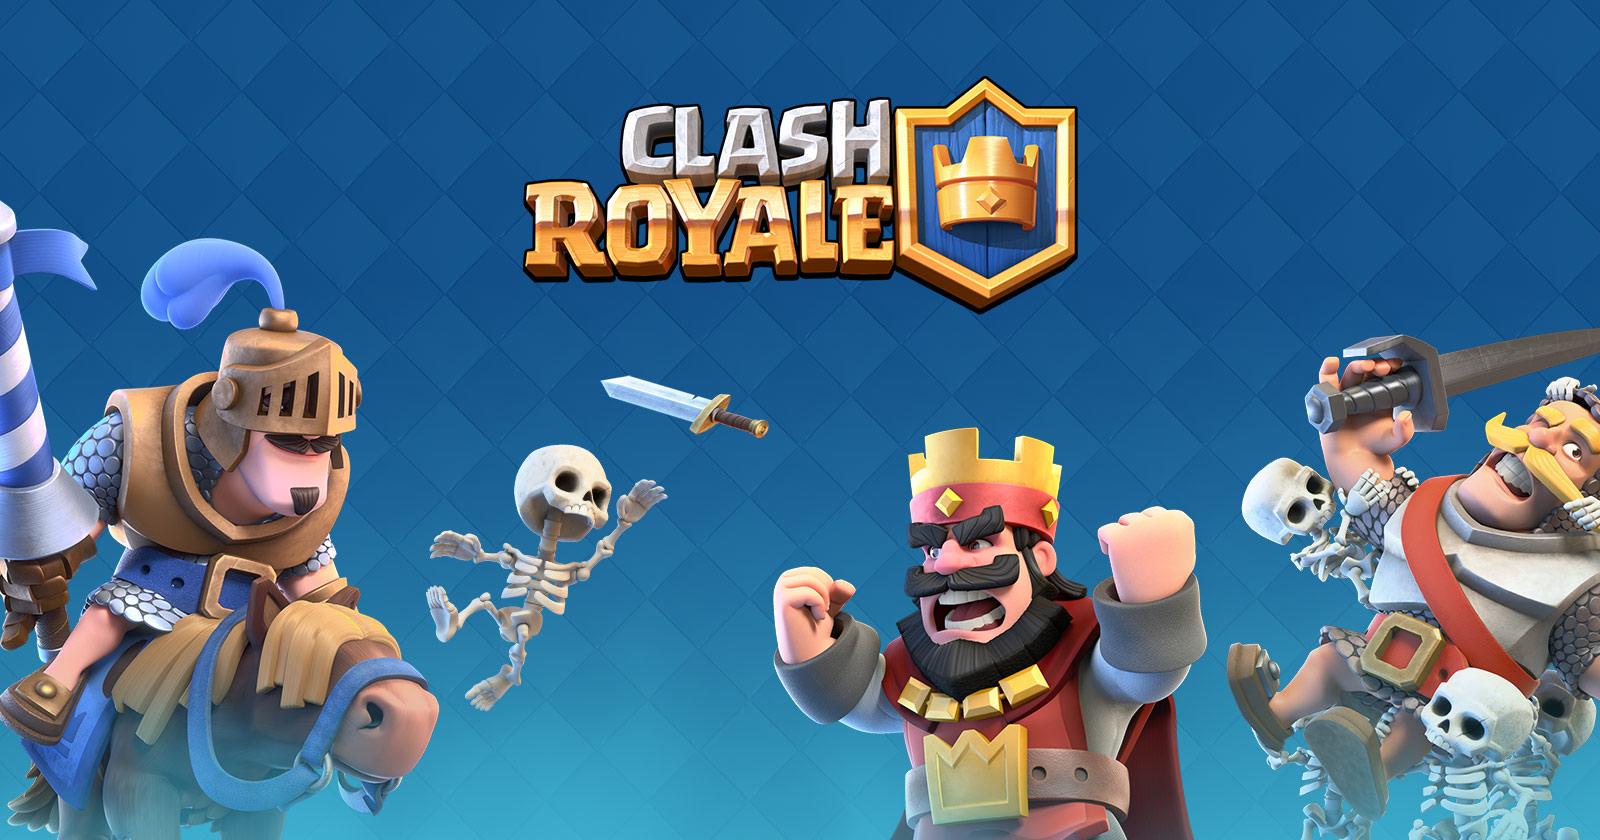 clash-royale-update-leaks-new-cards-sneak-peek-may-3-legendary-balancing-changes